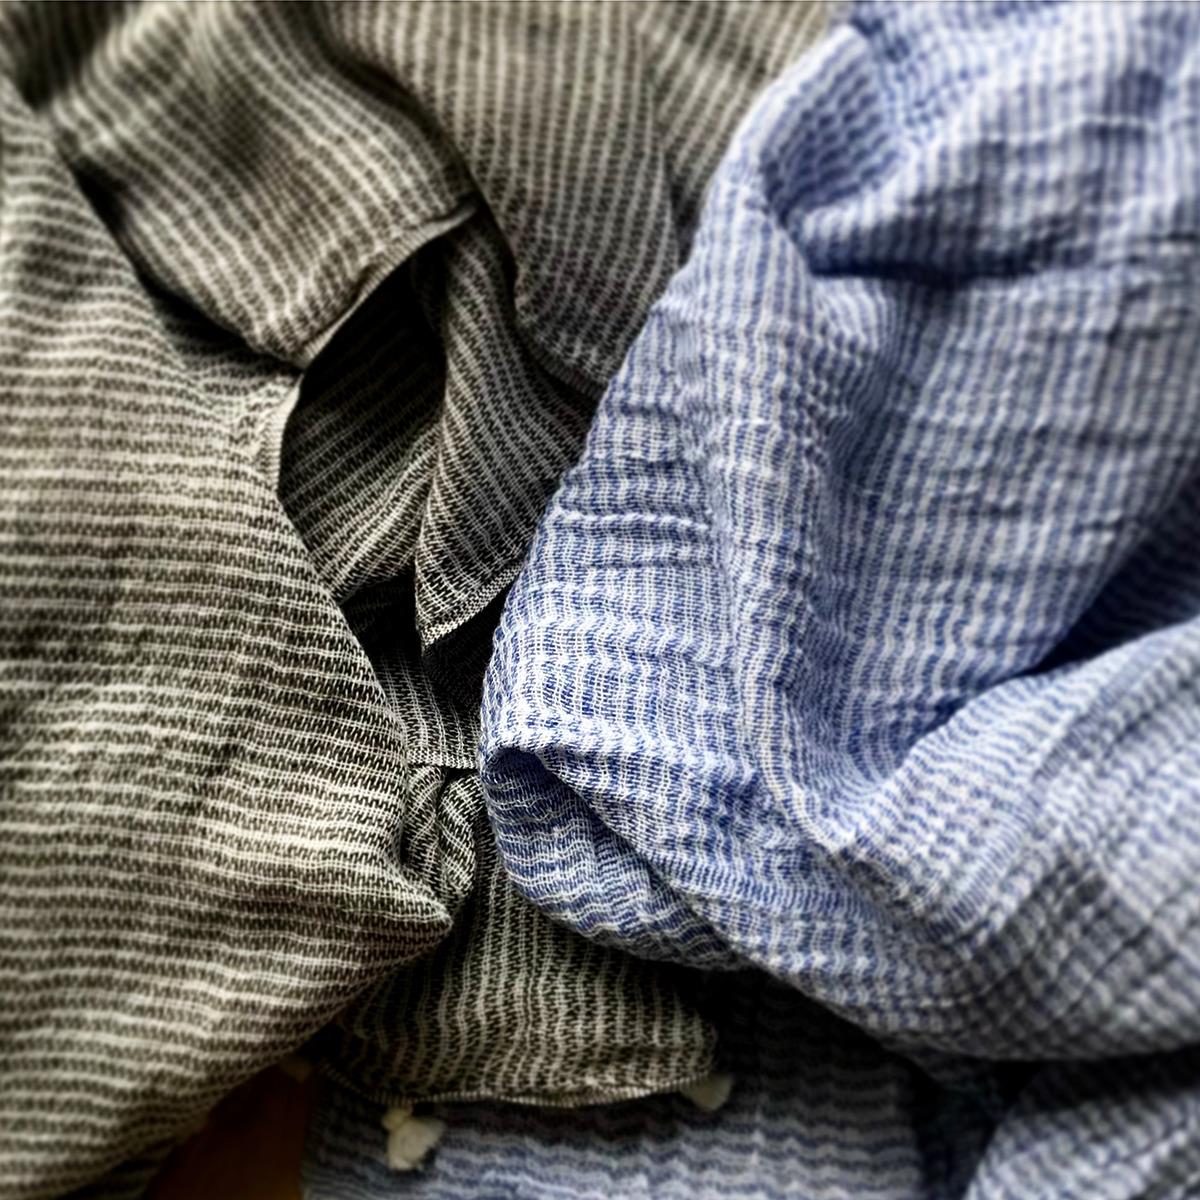 Ateljé Stockholm. Krinklad handduk ekologisk bomull.